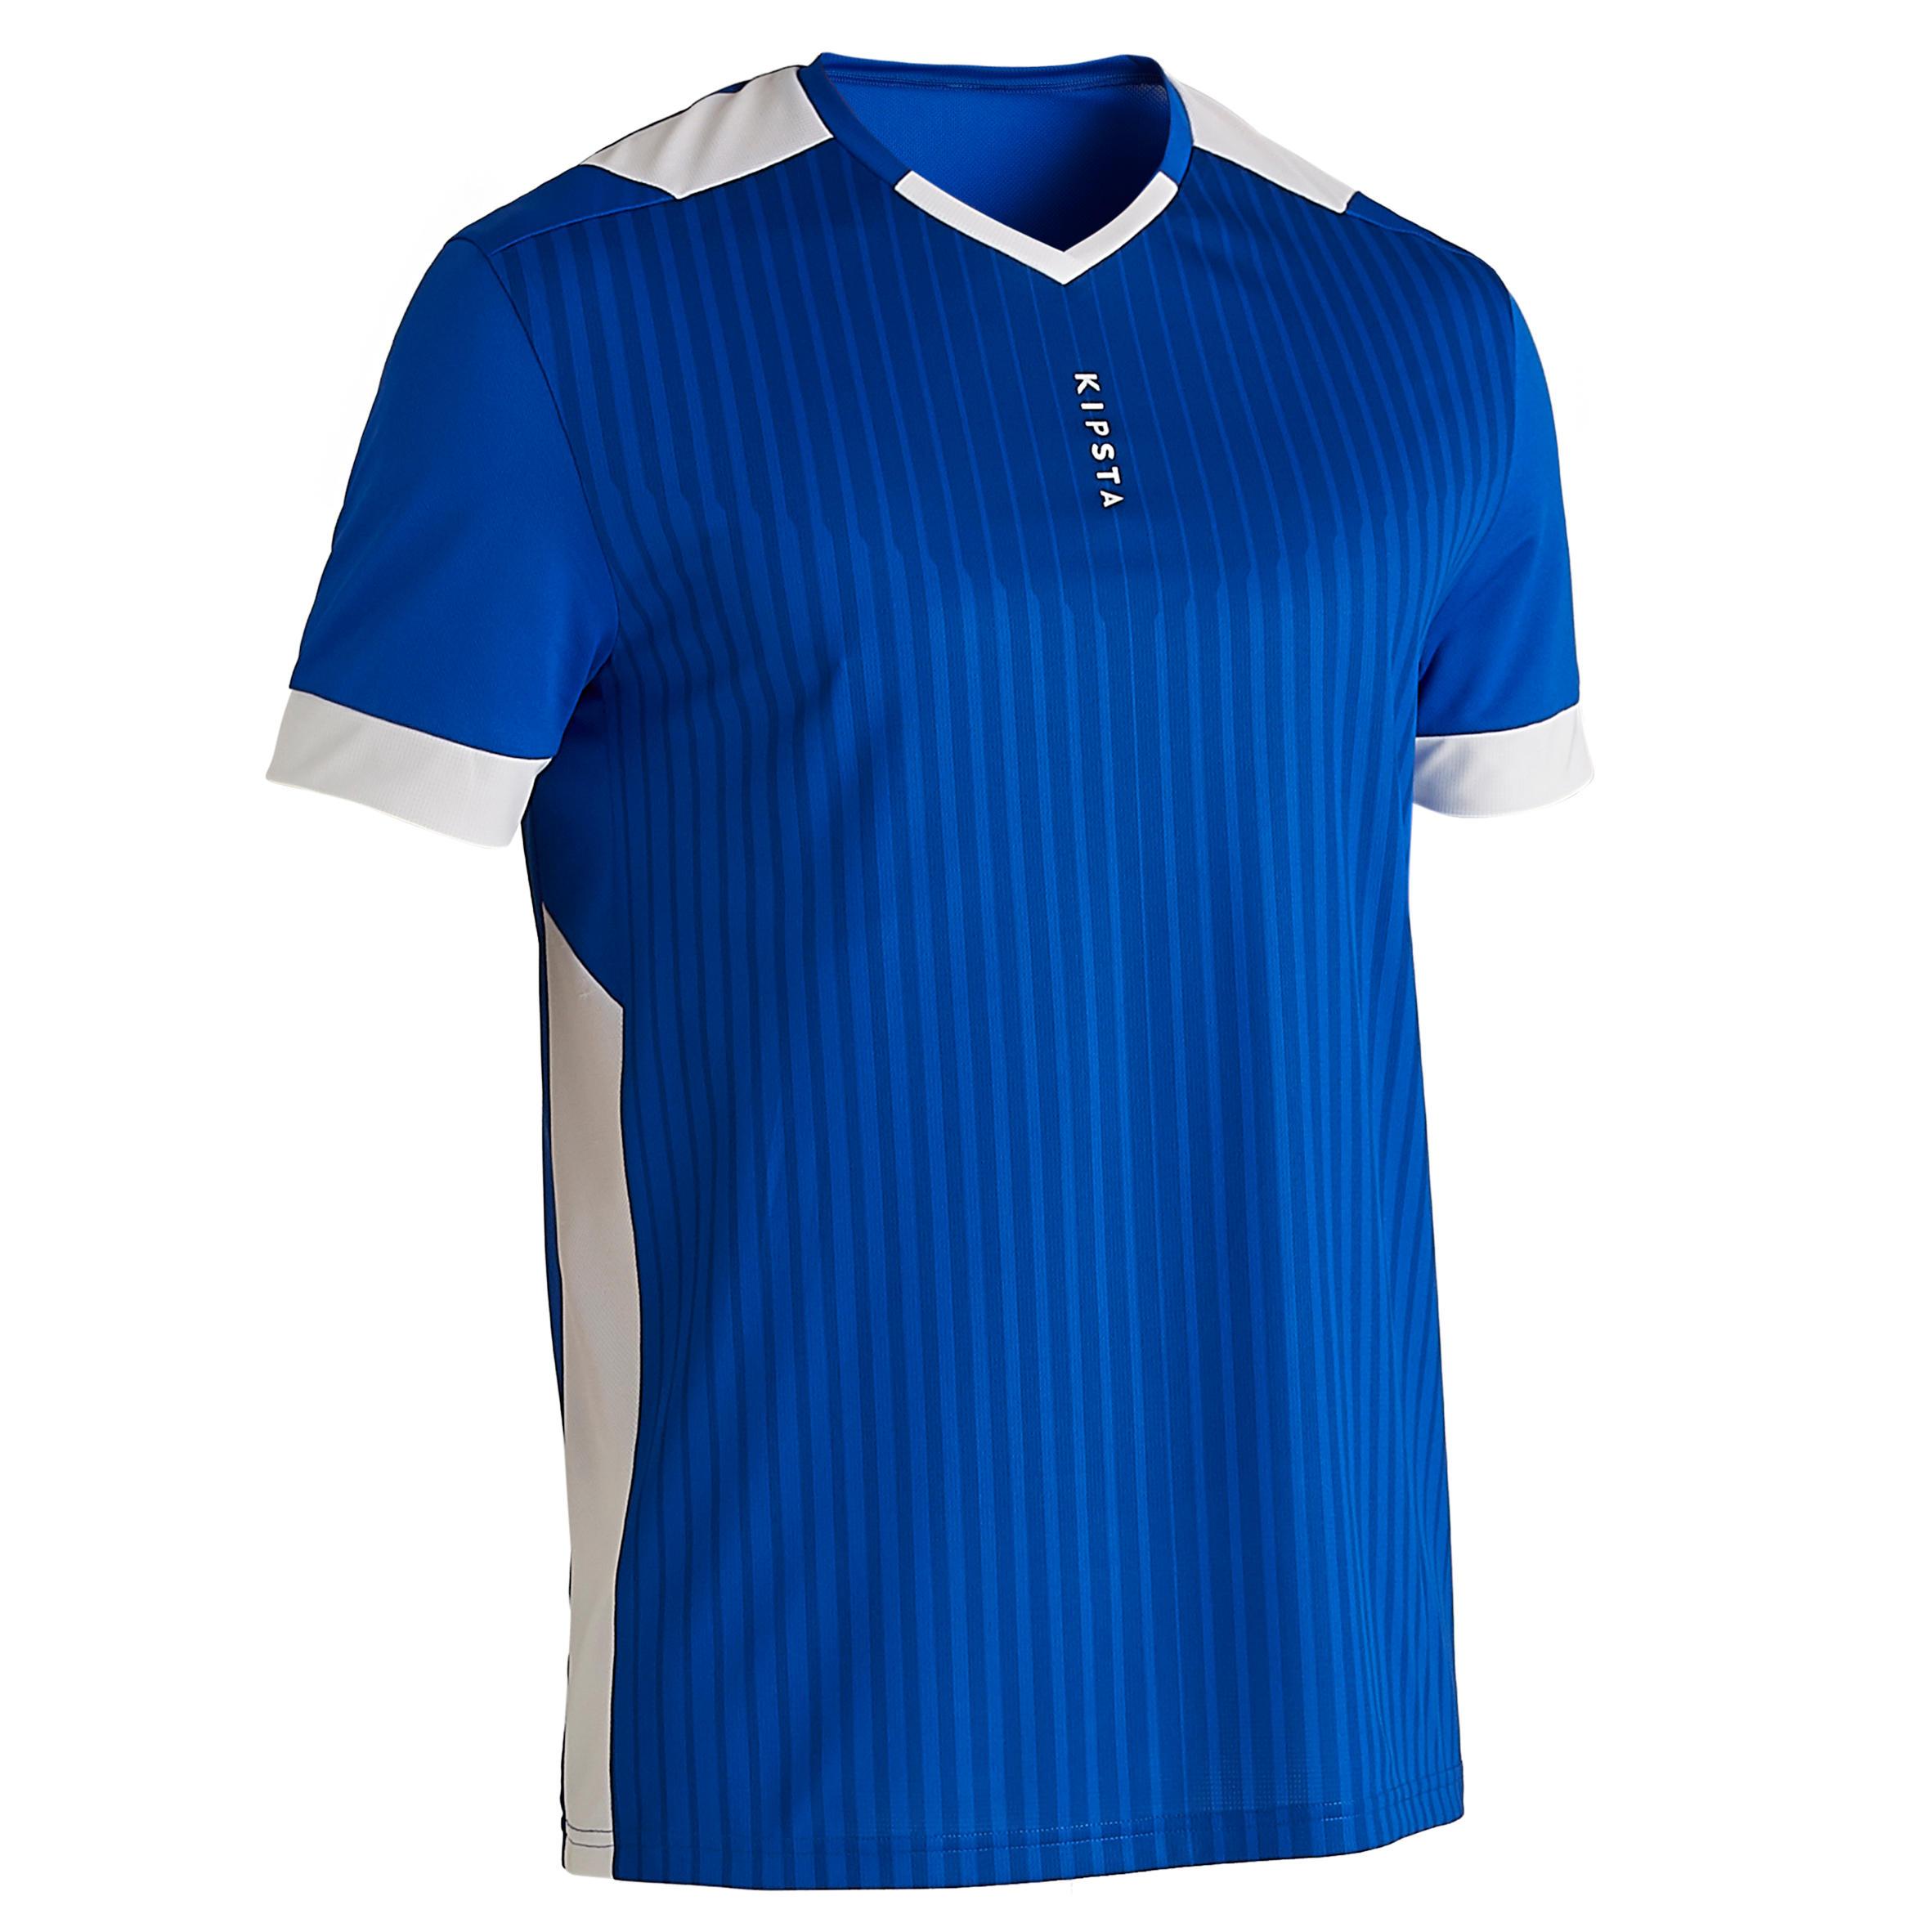 Fußballtrikot F500 Erwachsene   Sportbekleidung > Trikots   Kipsta